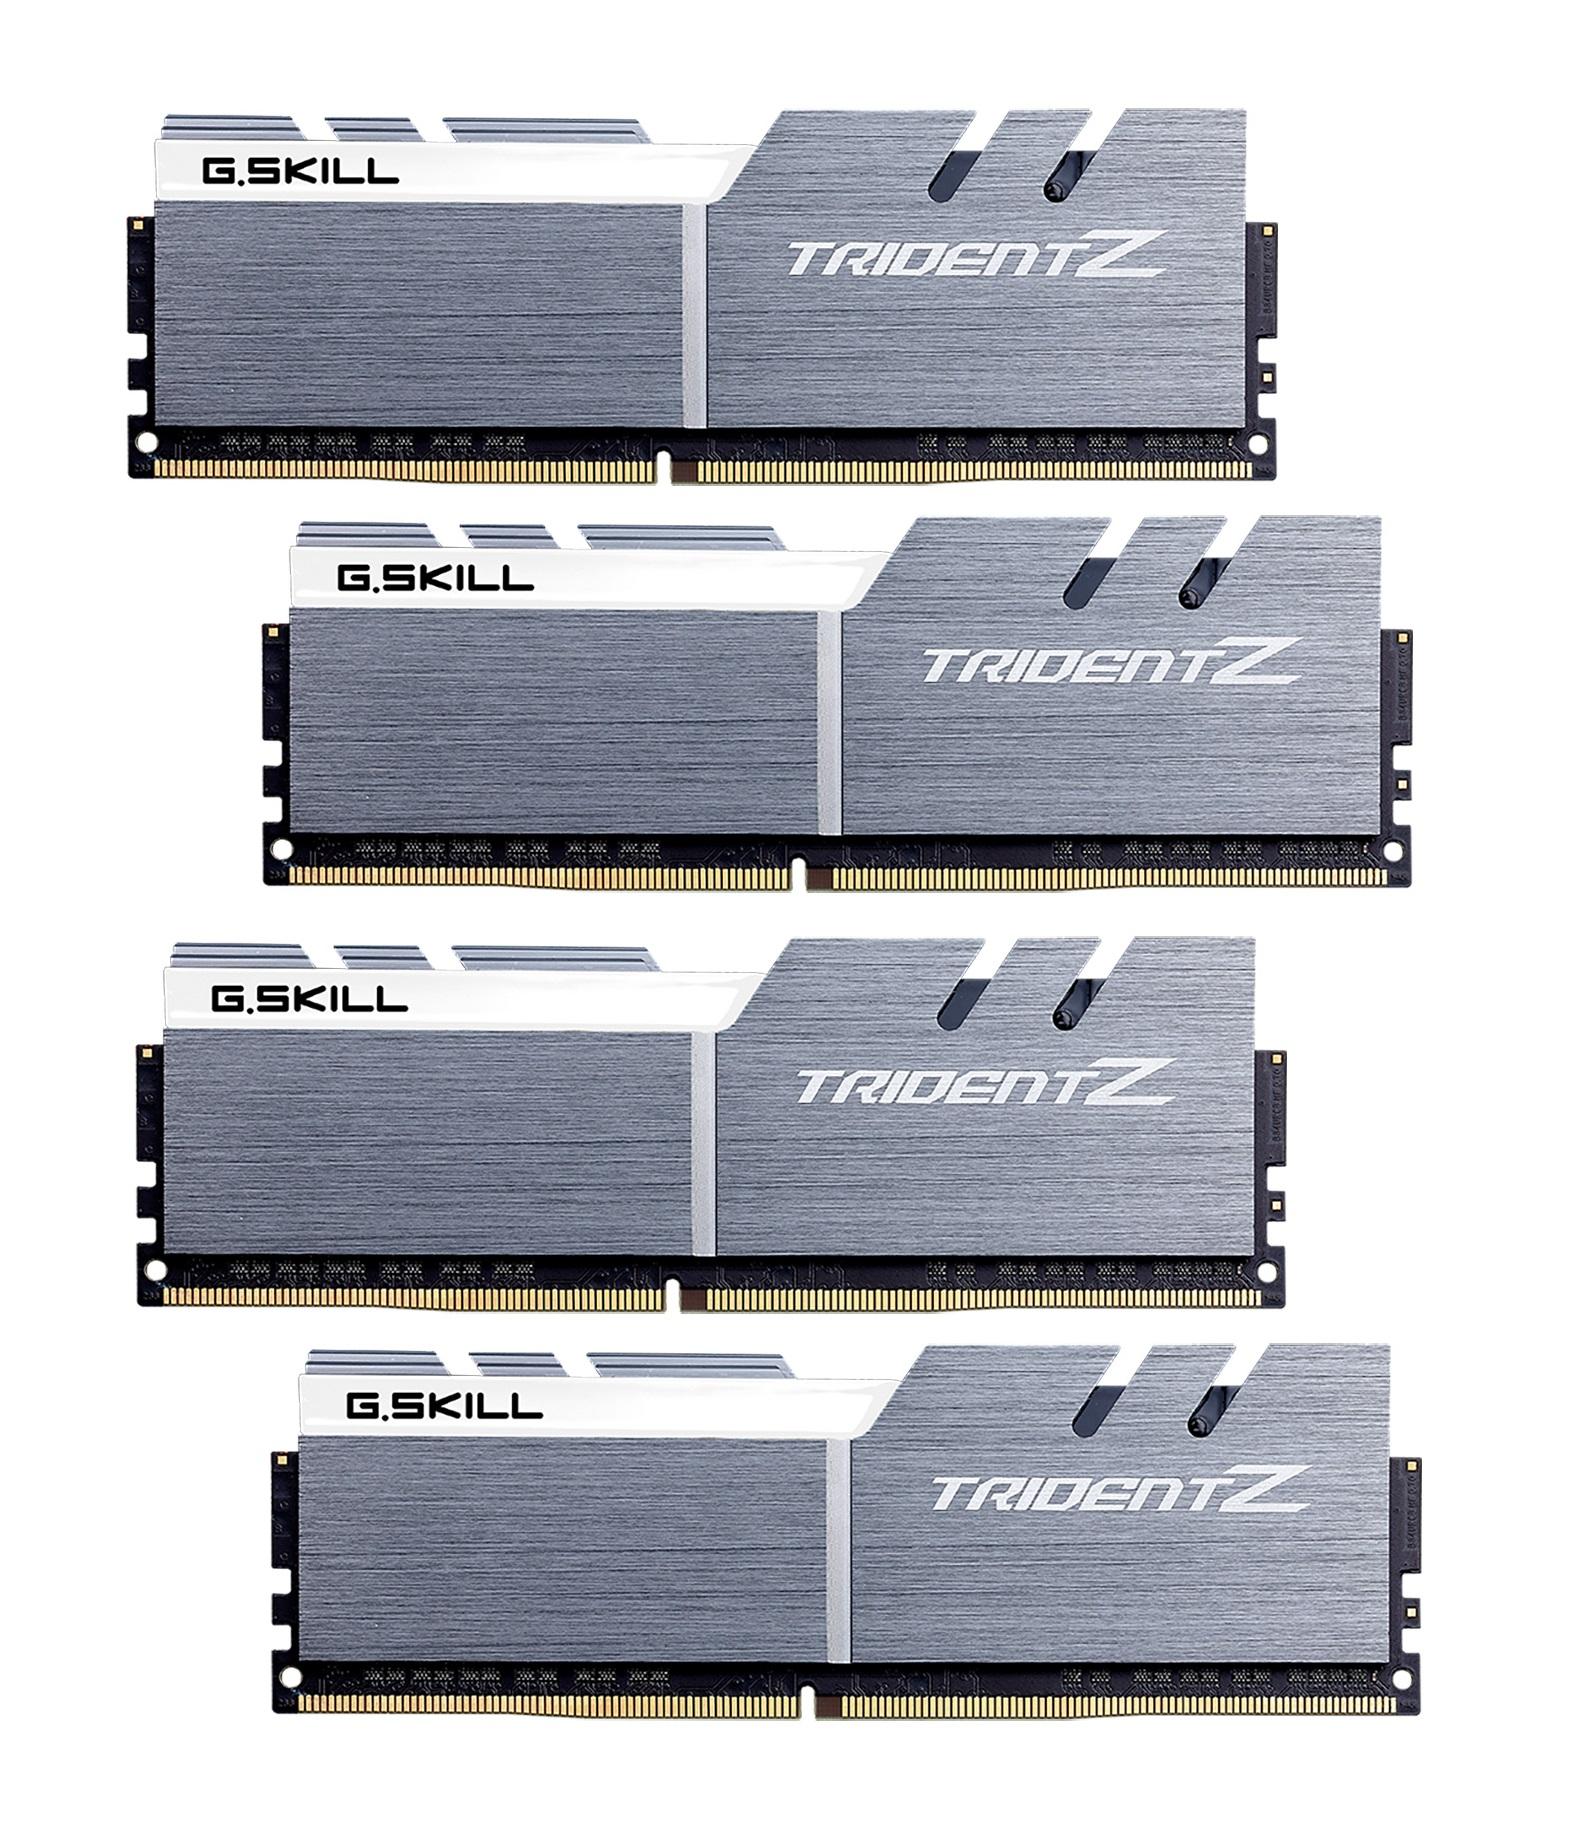 64GB DDR4 RAM Memory from MemoryC.com